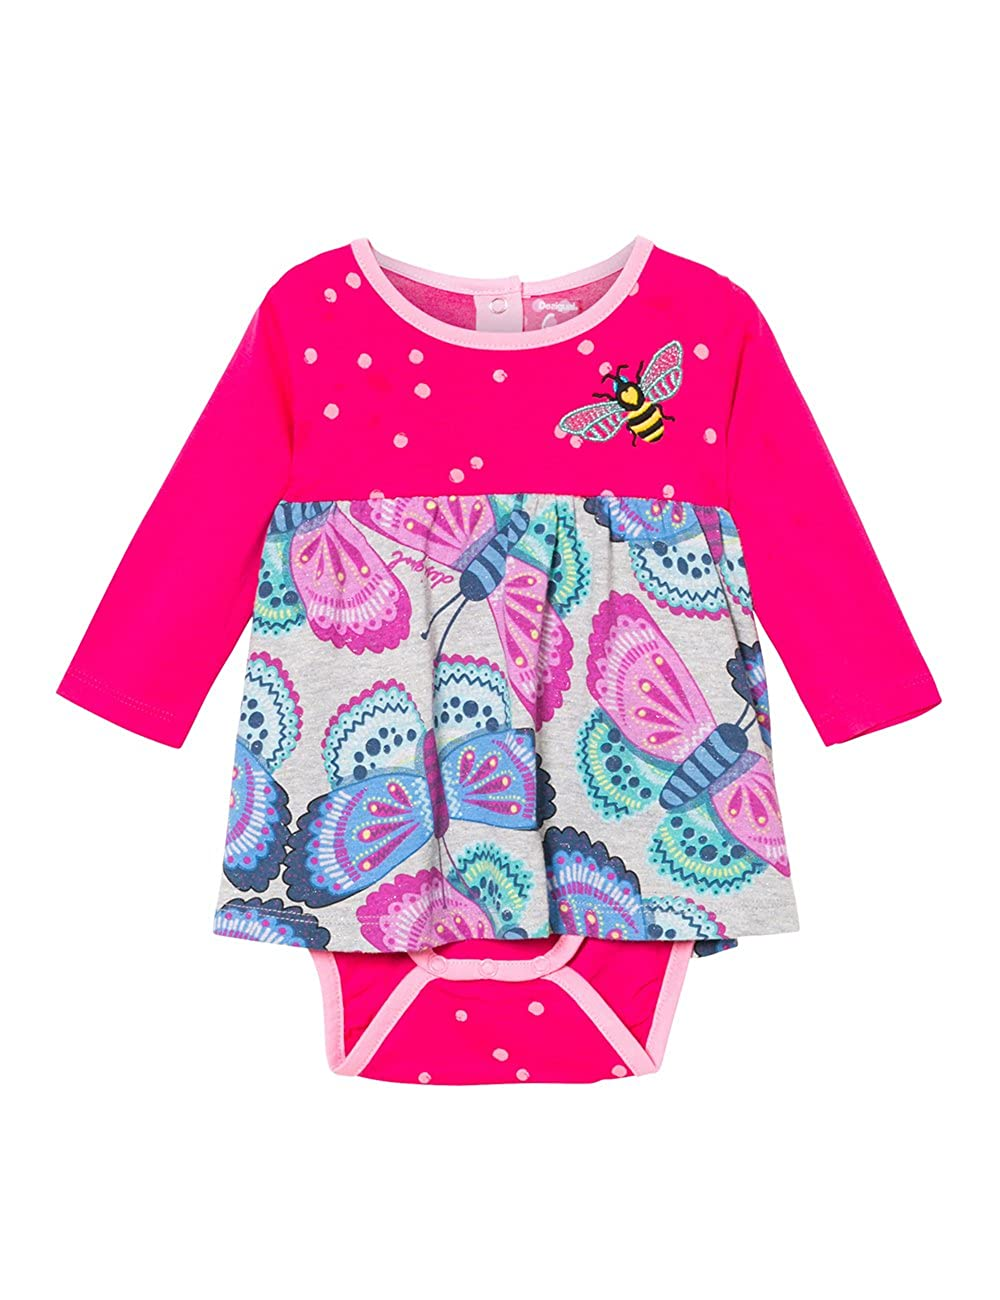 Desigual Vest_Carlota, Vestido para Bebés